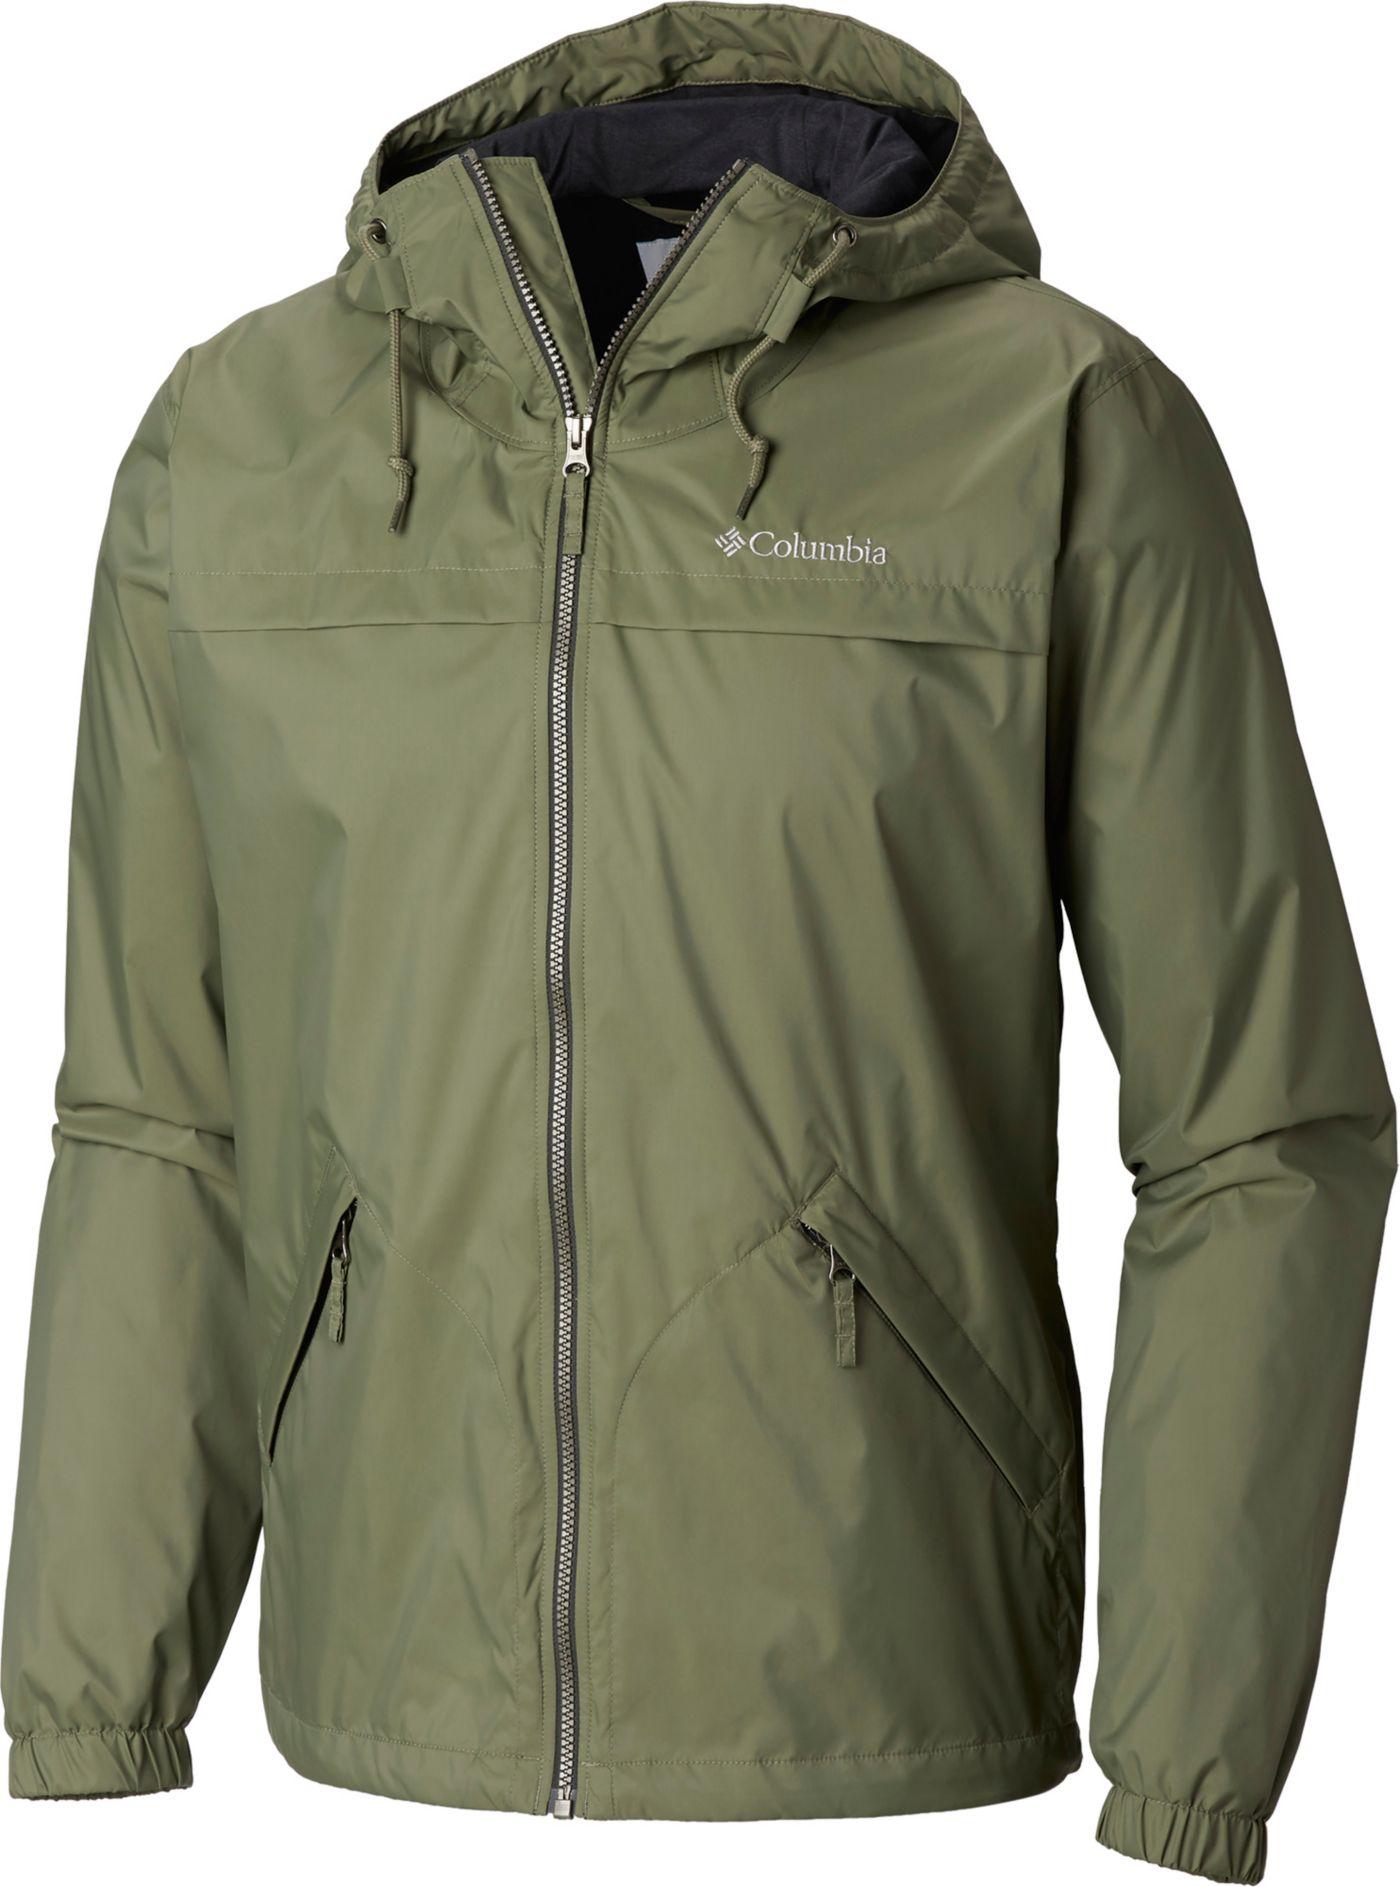 Columbia Men's Oroville Creek Lined Rain Jacket (Regular and Big & Tall)